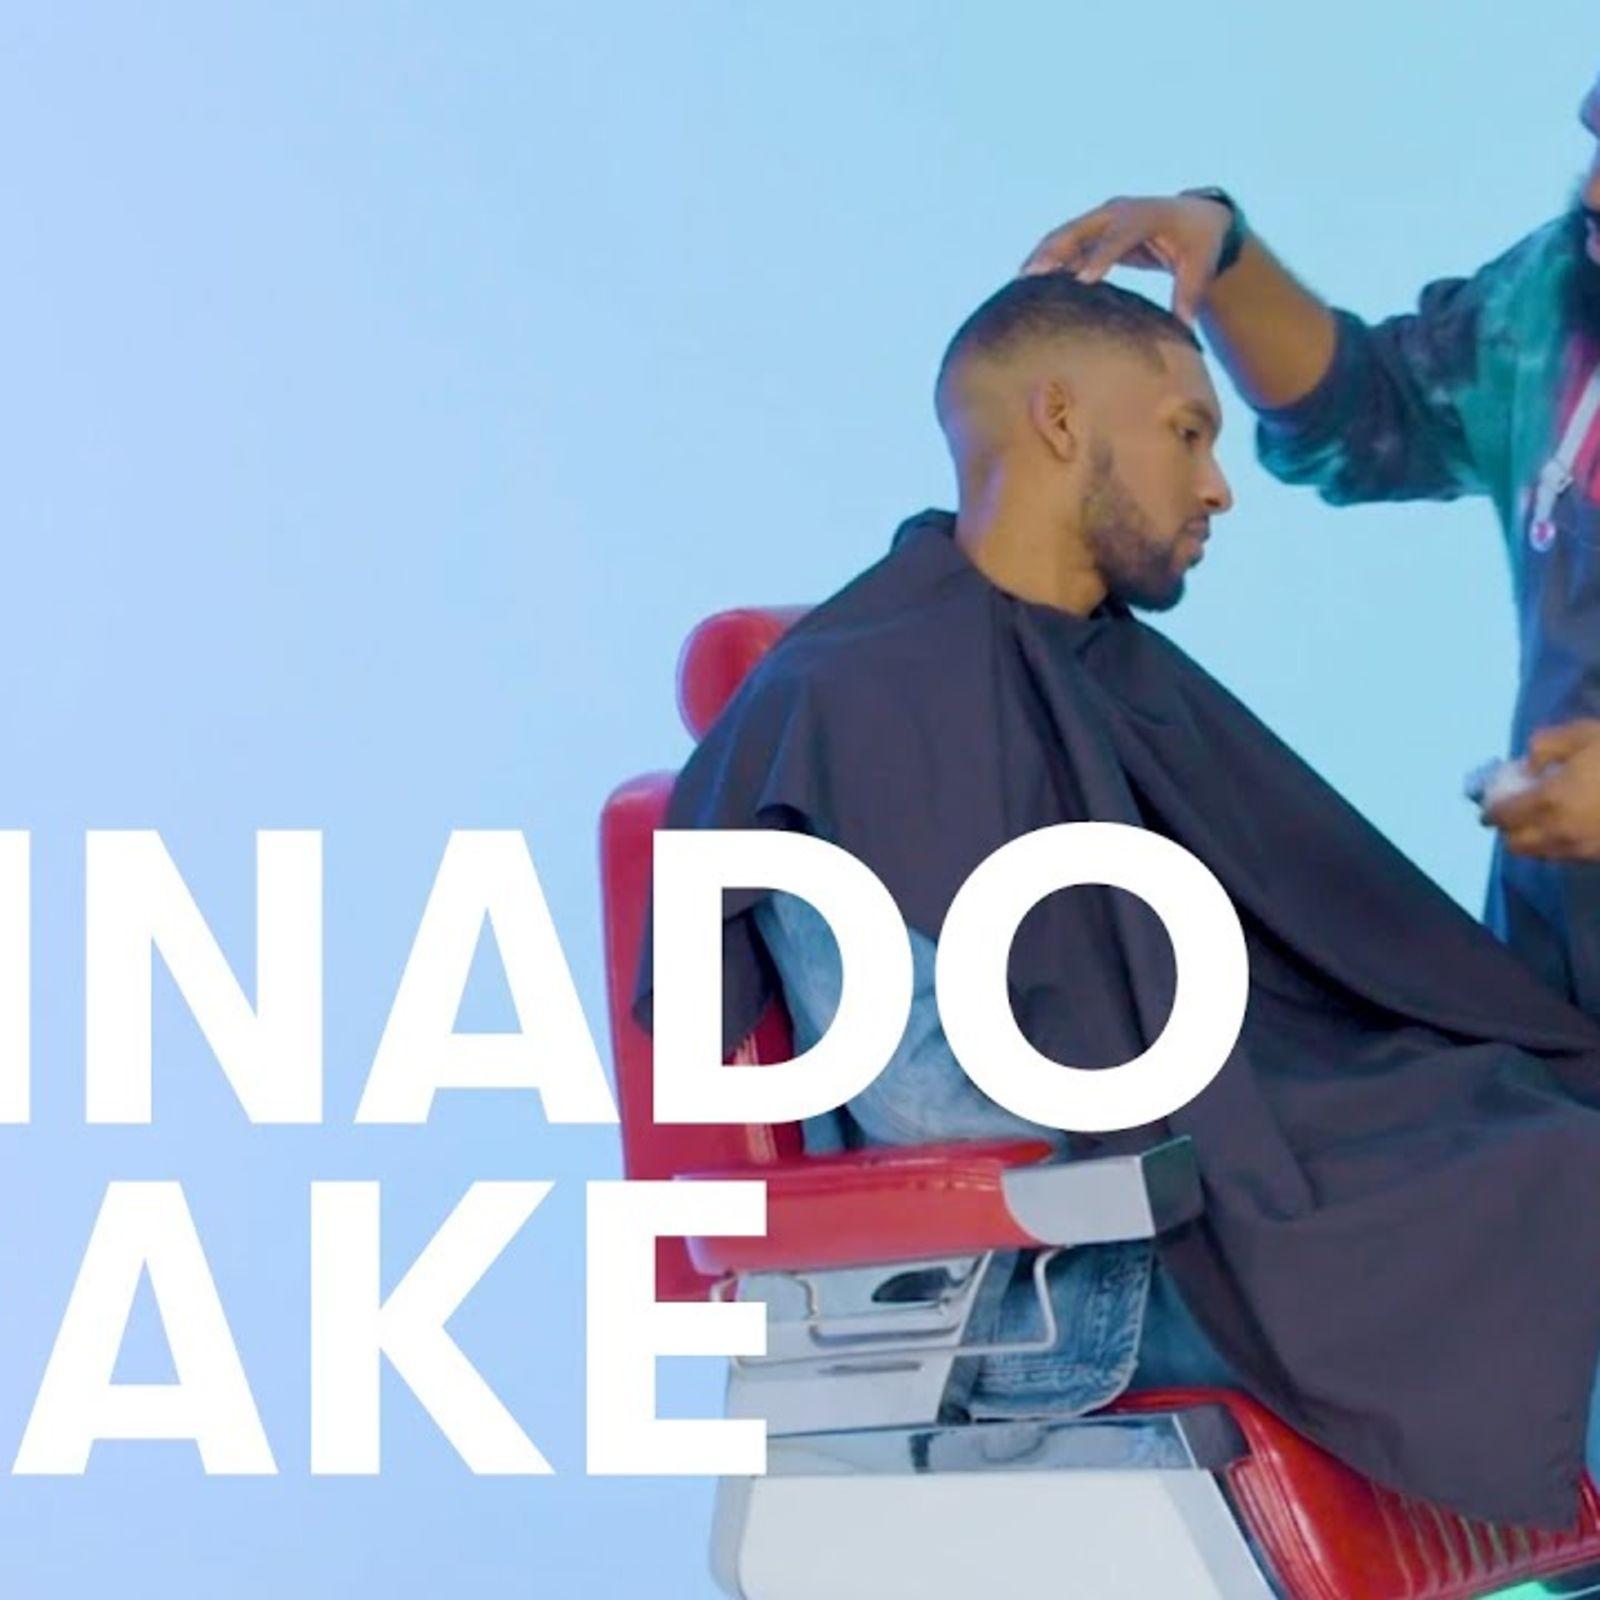 Recreando el peinado degradado de Drake